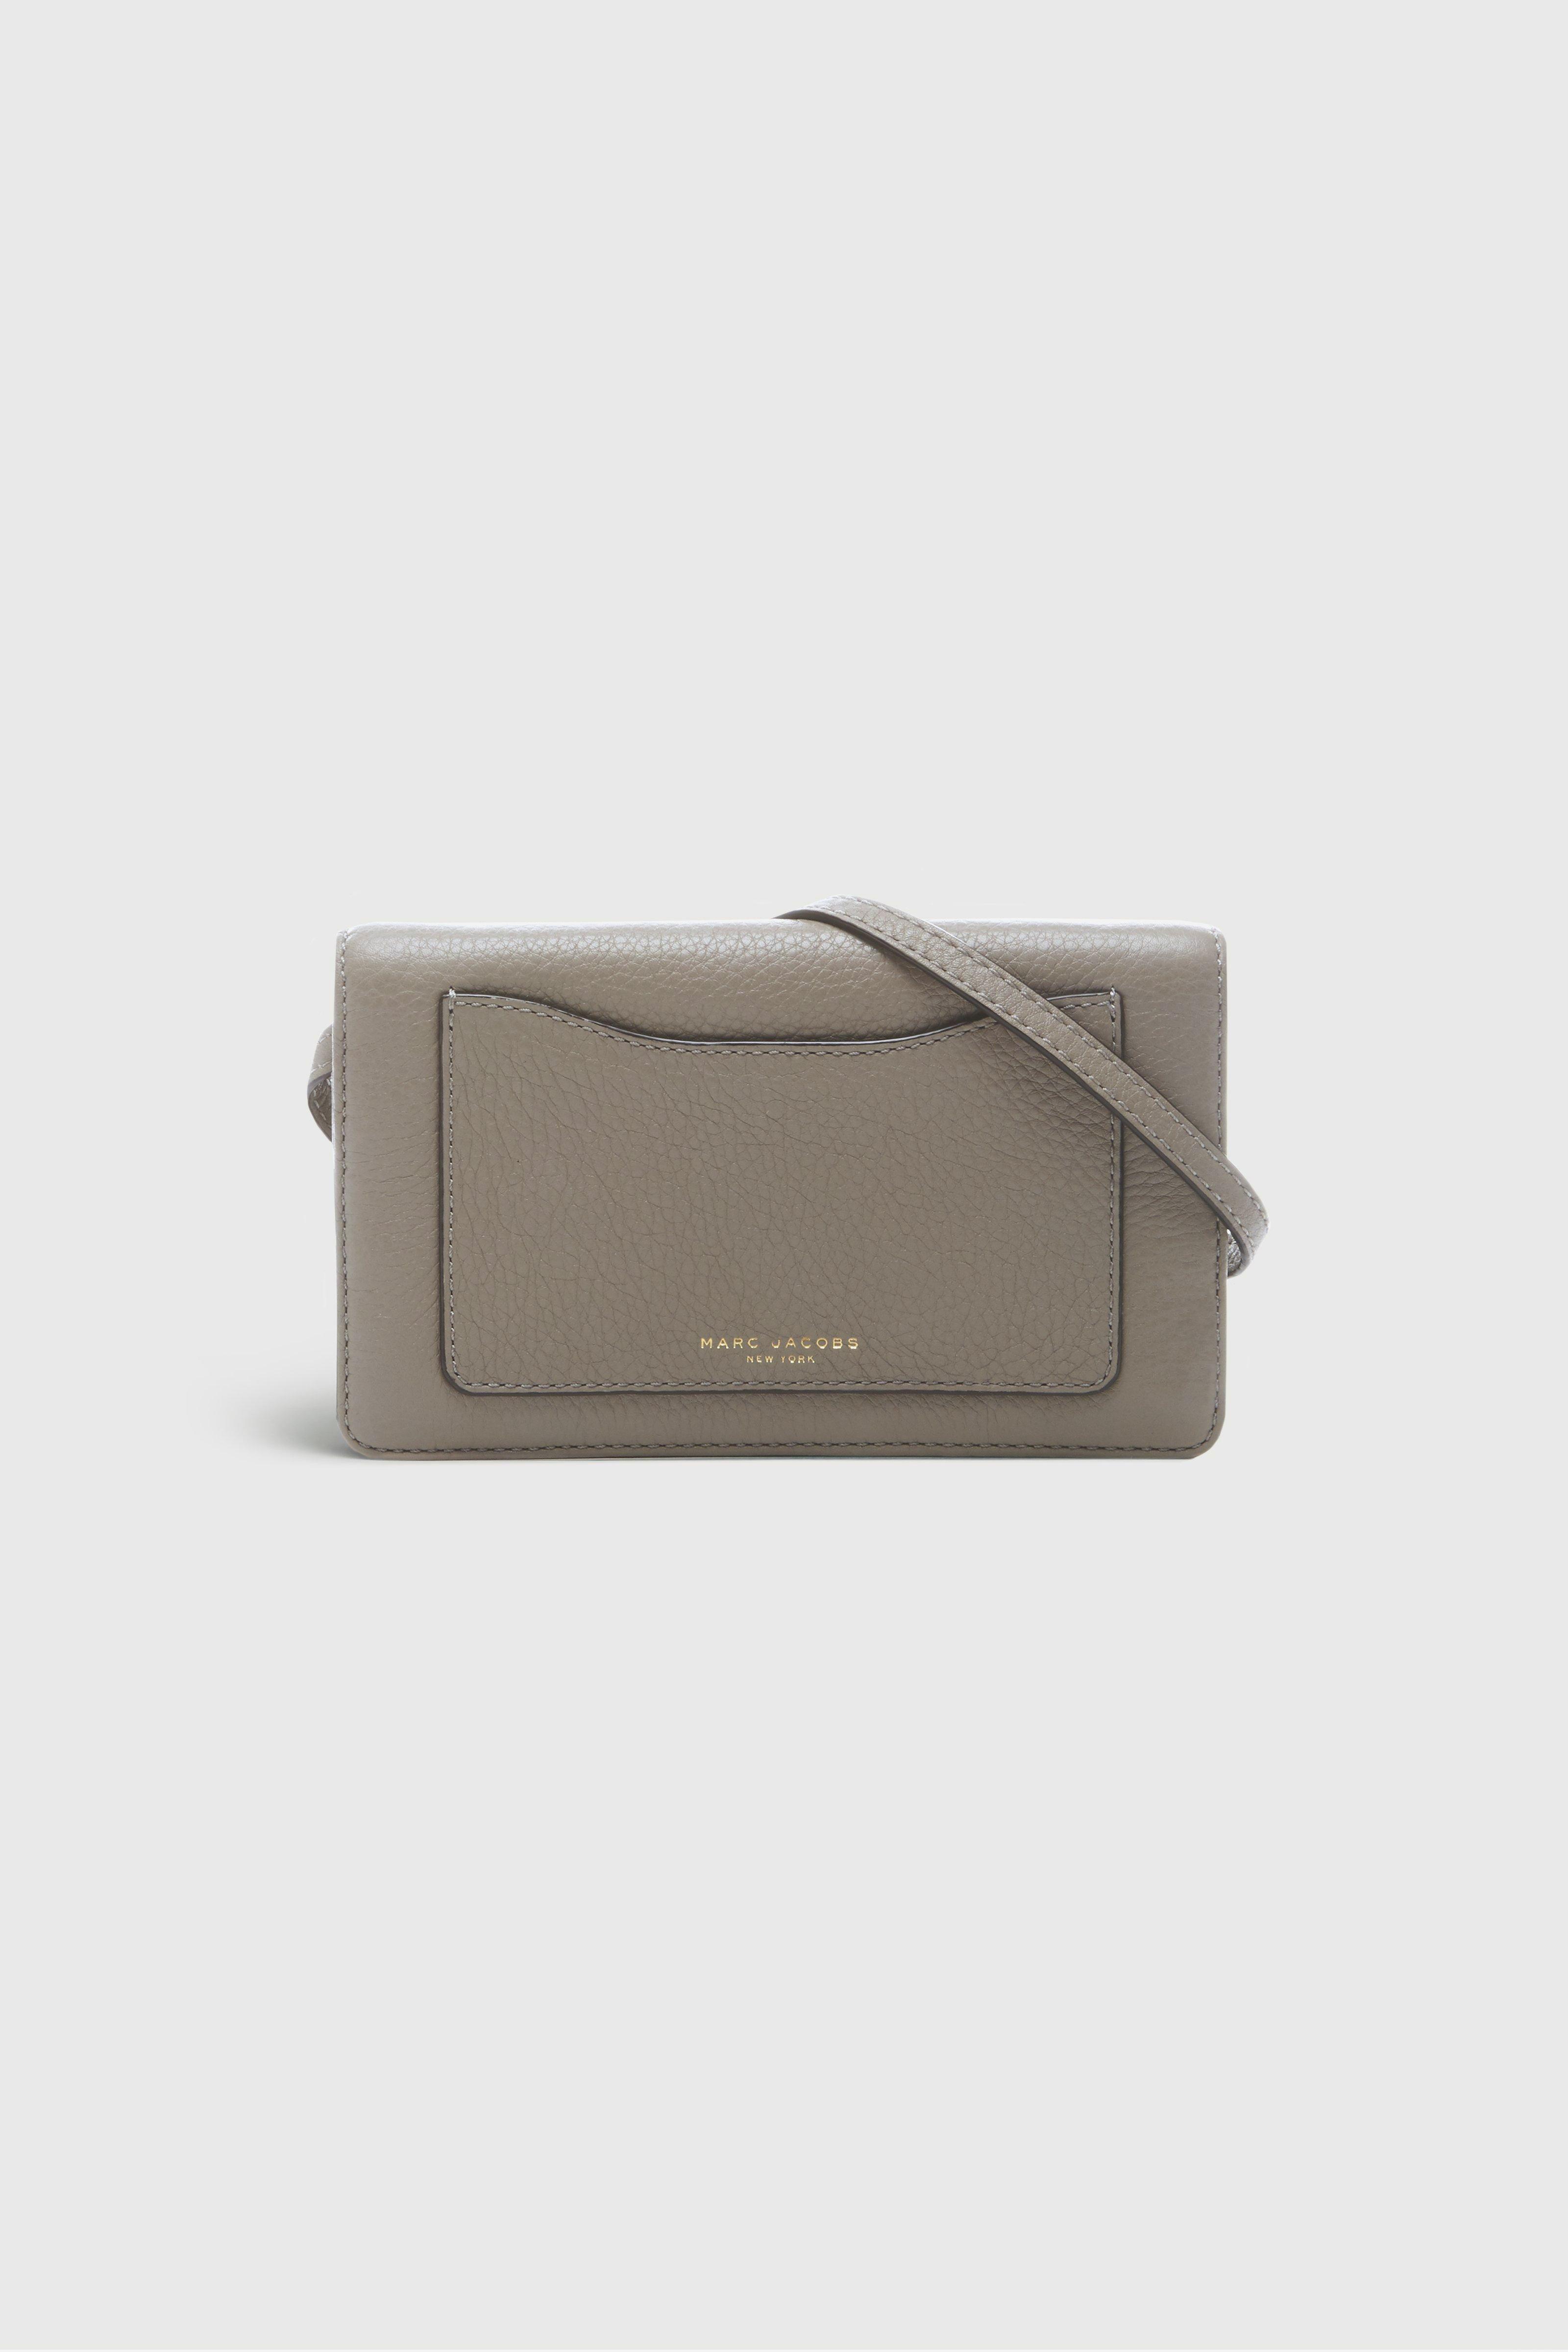 Marc Jacobs 28 - Recruit Wallet Leather Strap - Mink